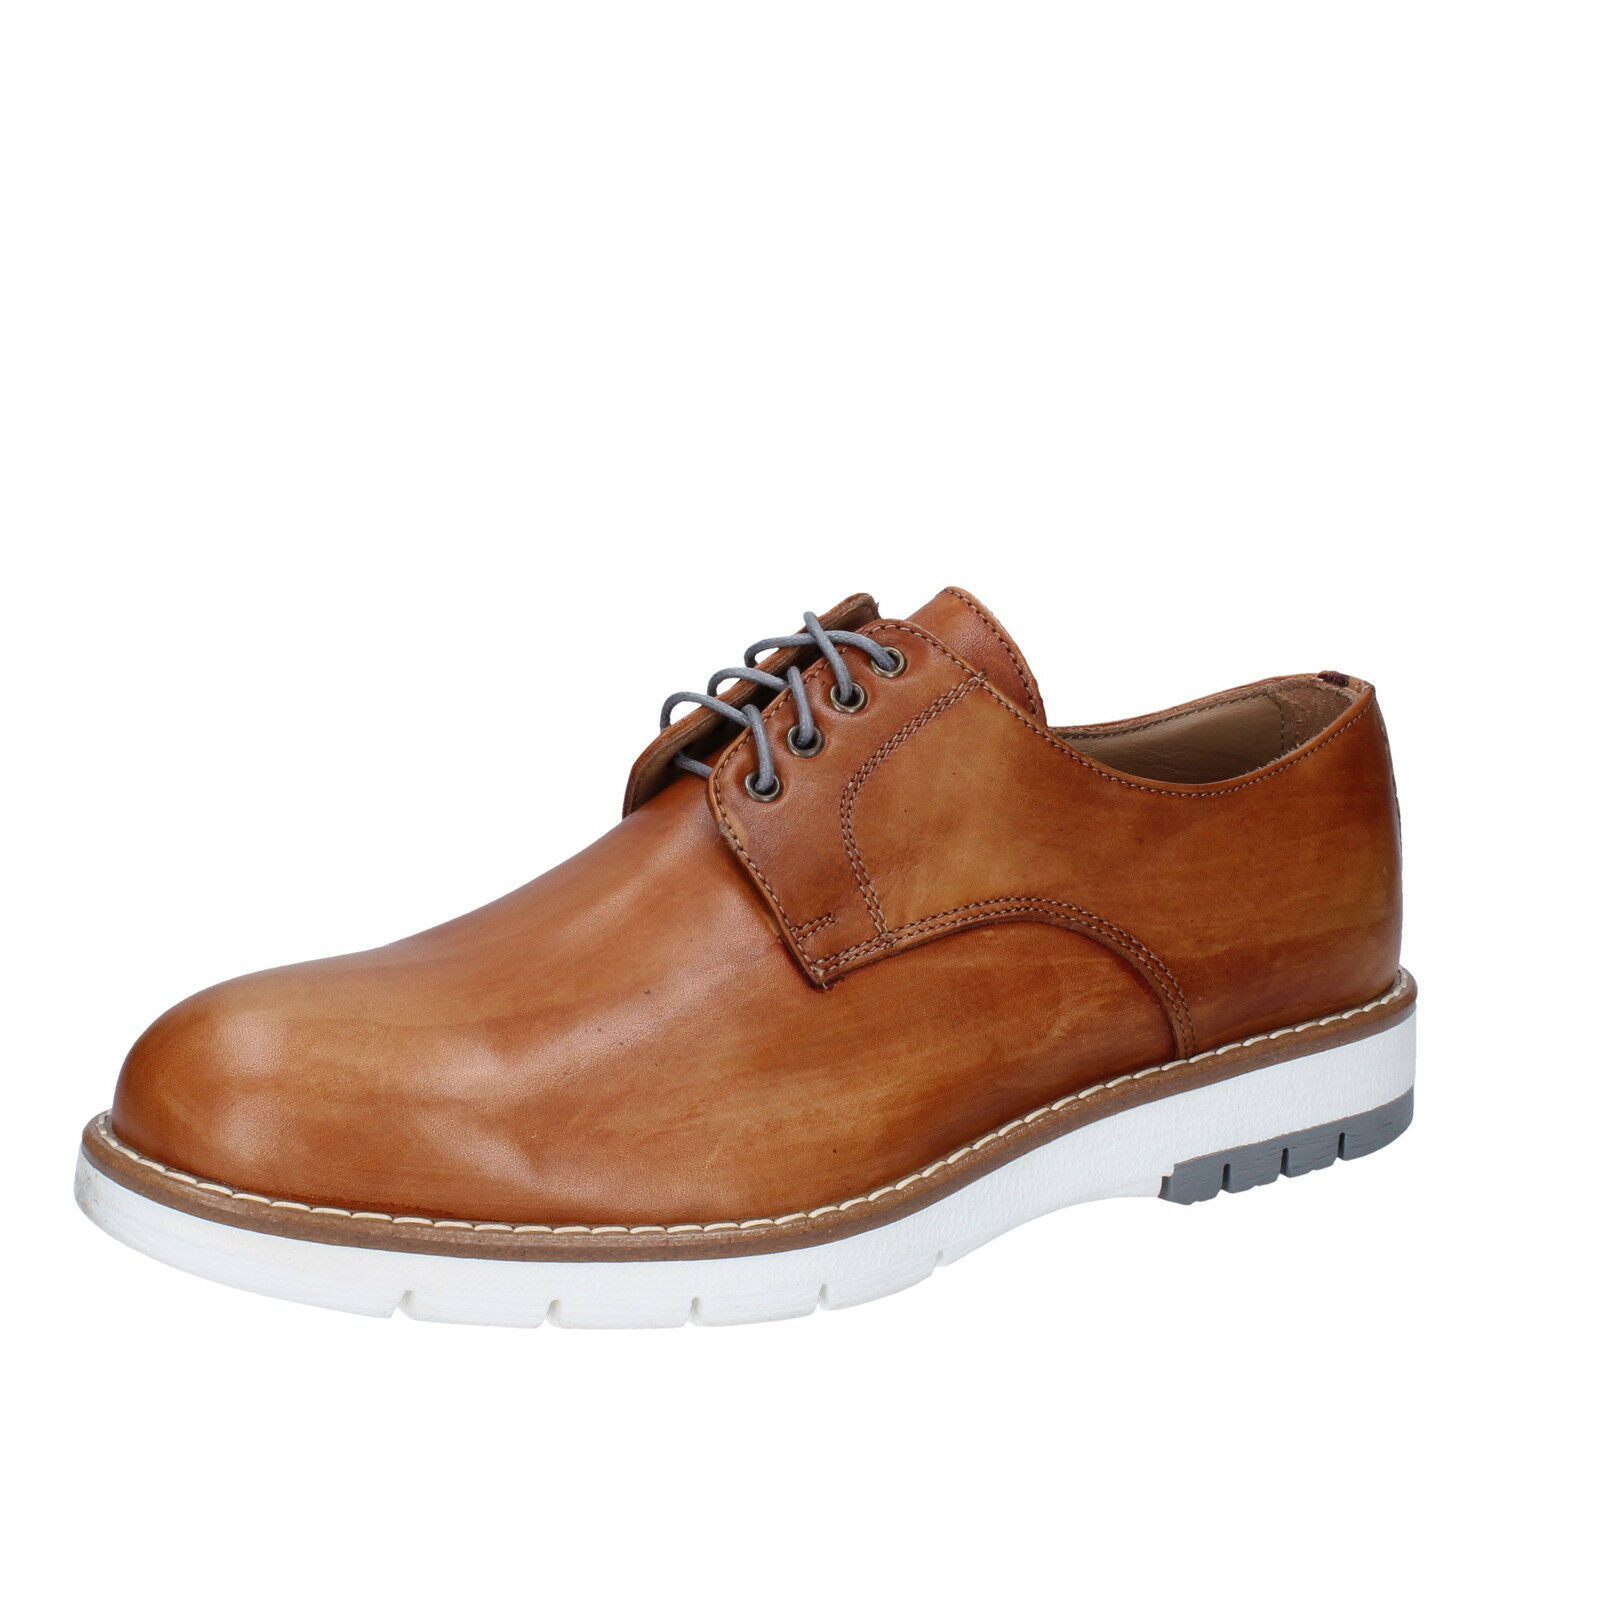 Men's shoes DI MELLA 10 () elegant brown leather BZ36-D